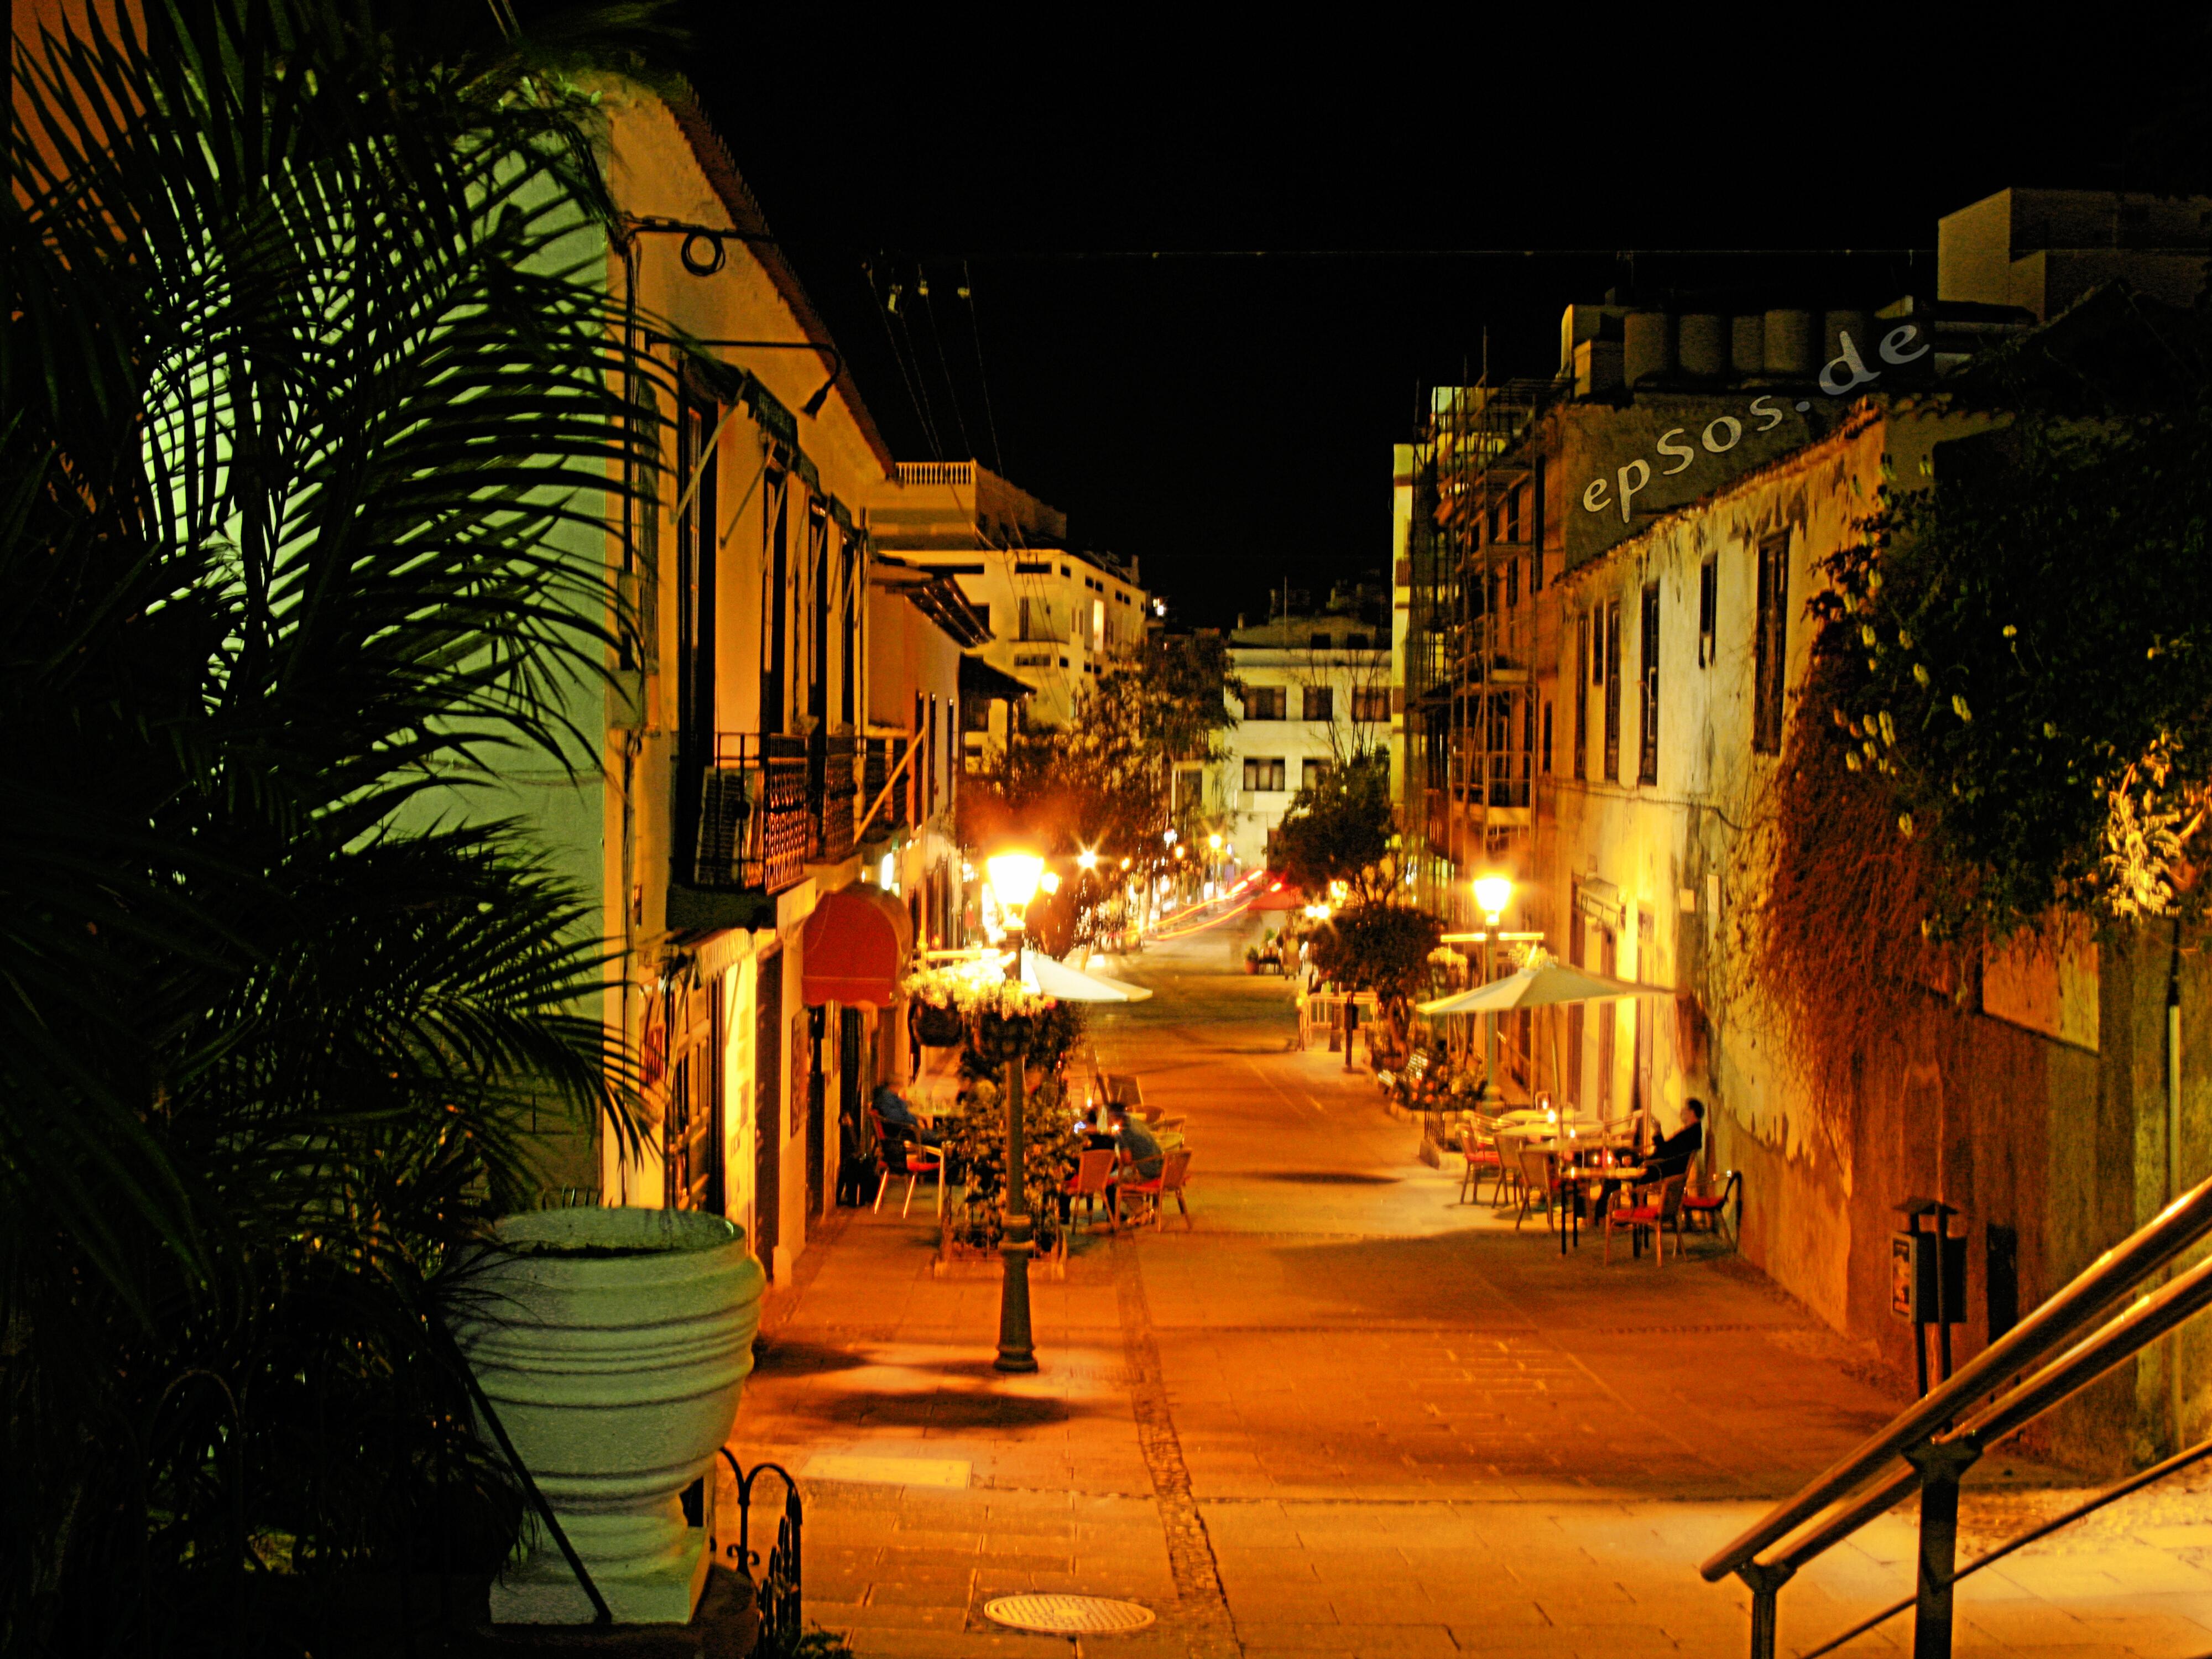 city street lights night - photo #11